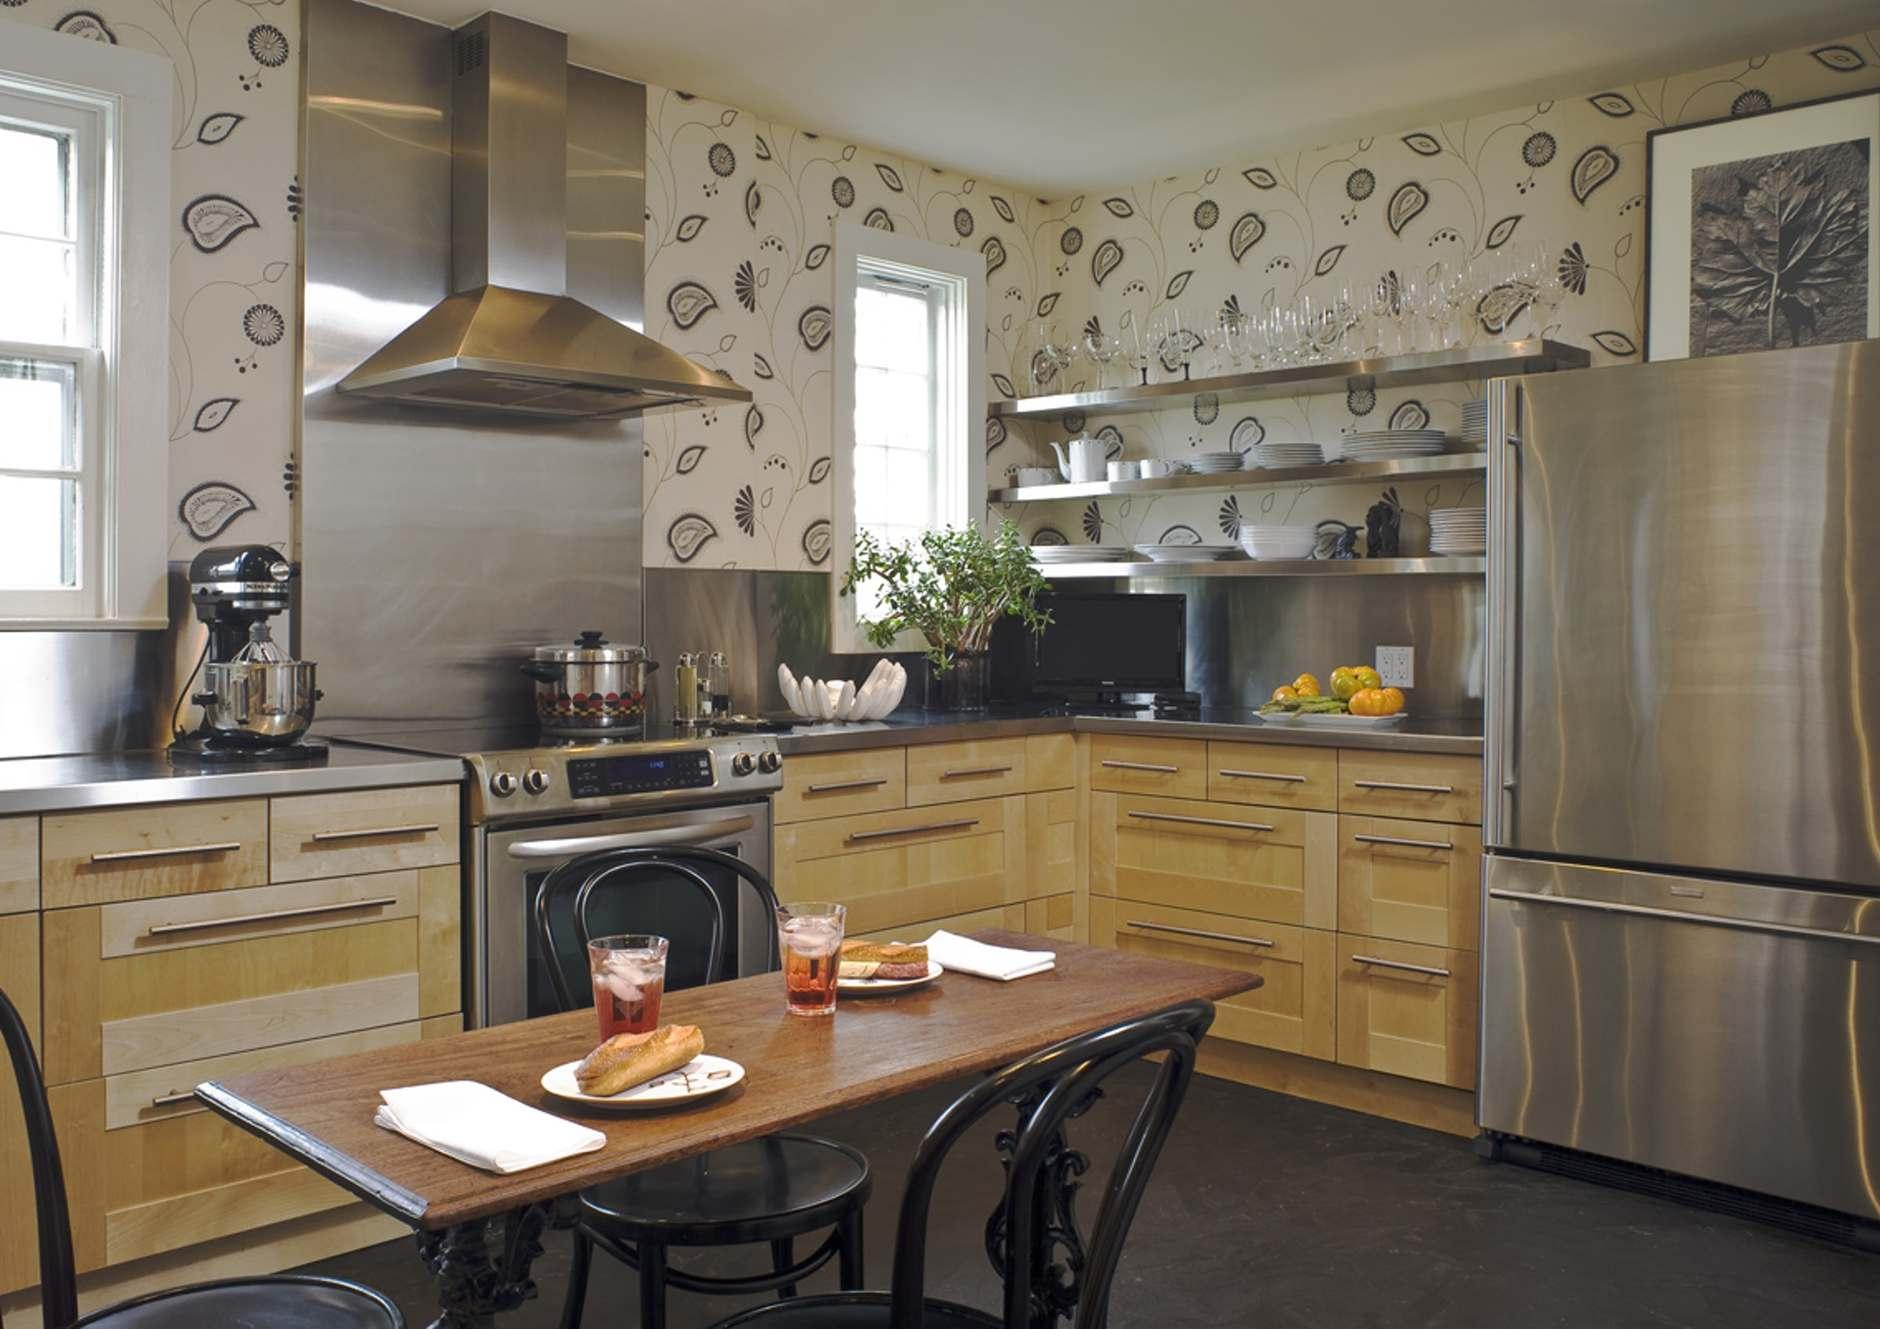 Обои на кухне: 10 свежих идей (галерея 0, фото 2)